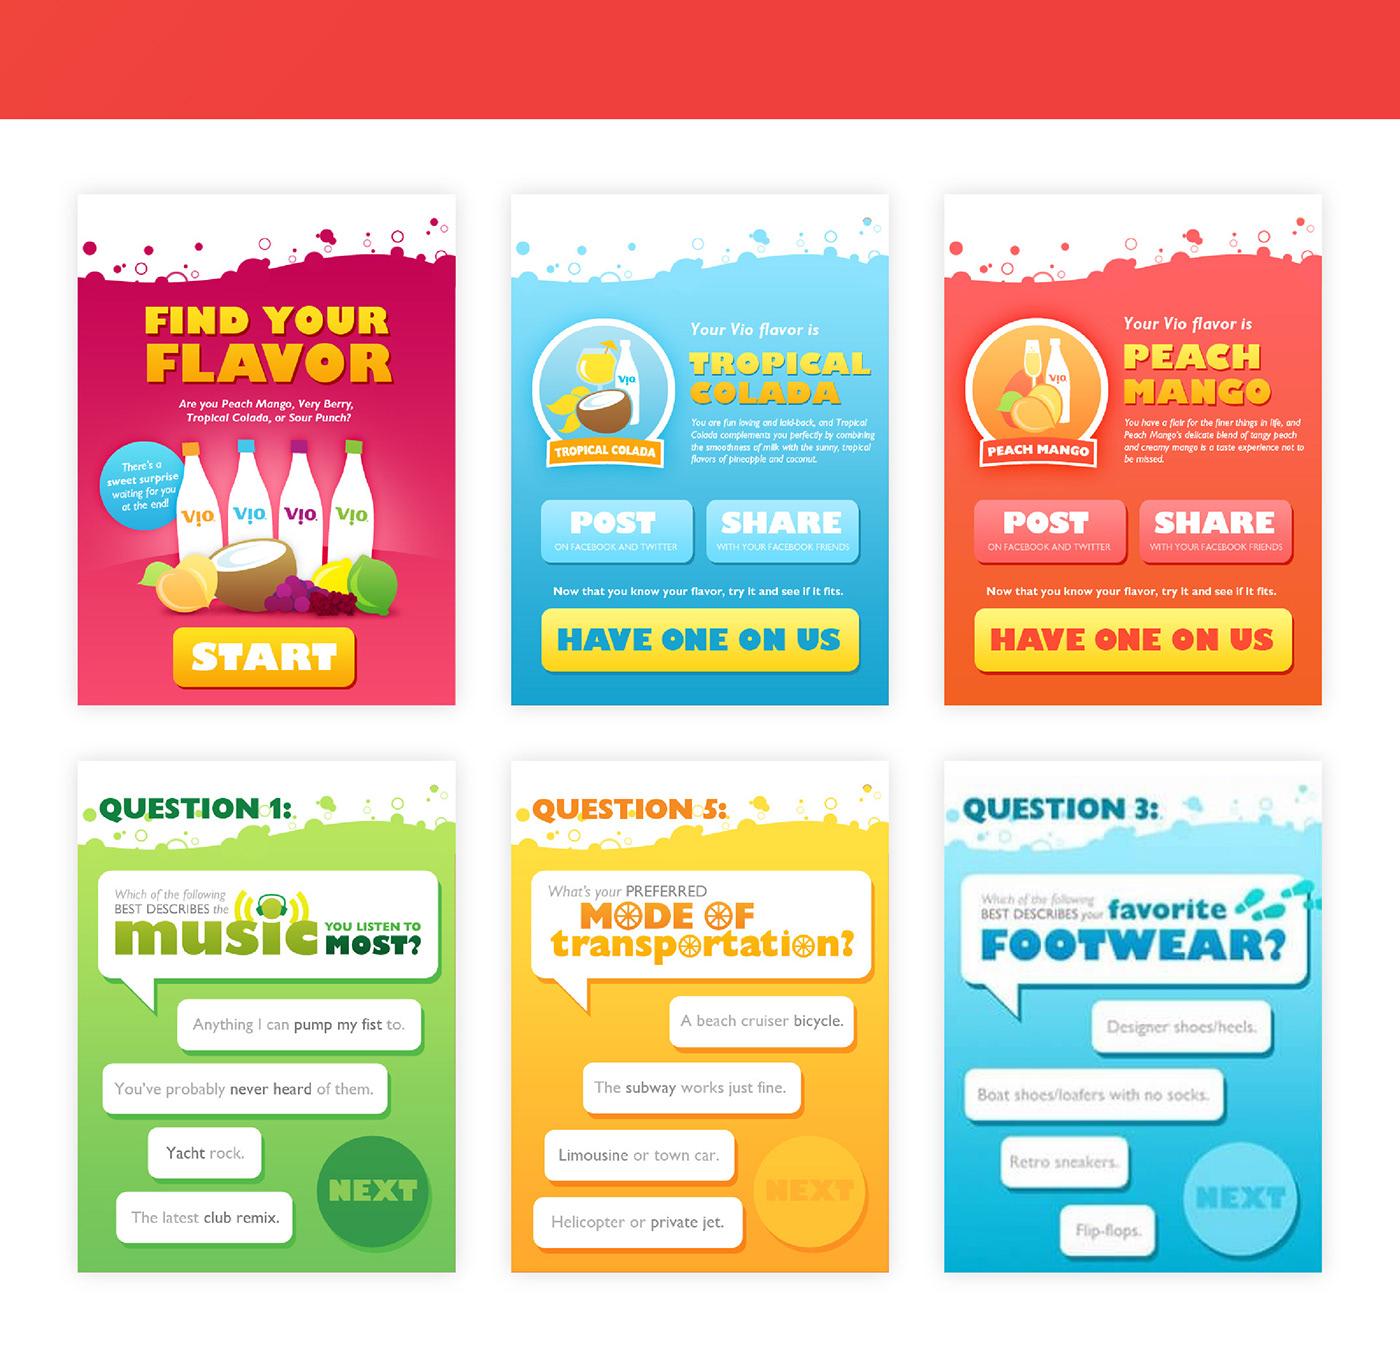 Vio Coca-Cola interactive Web